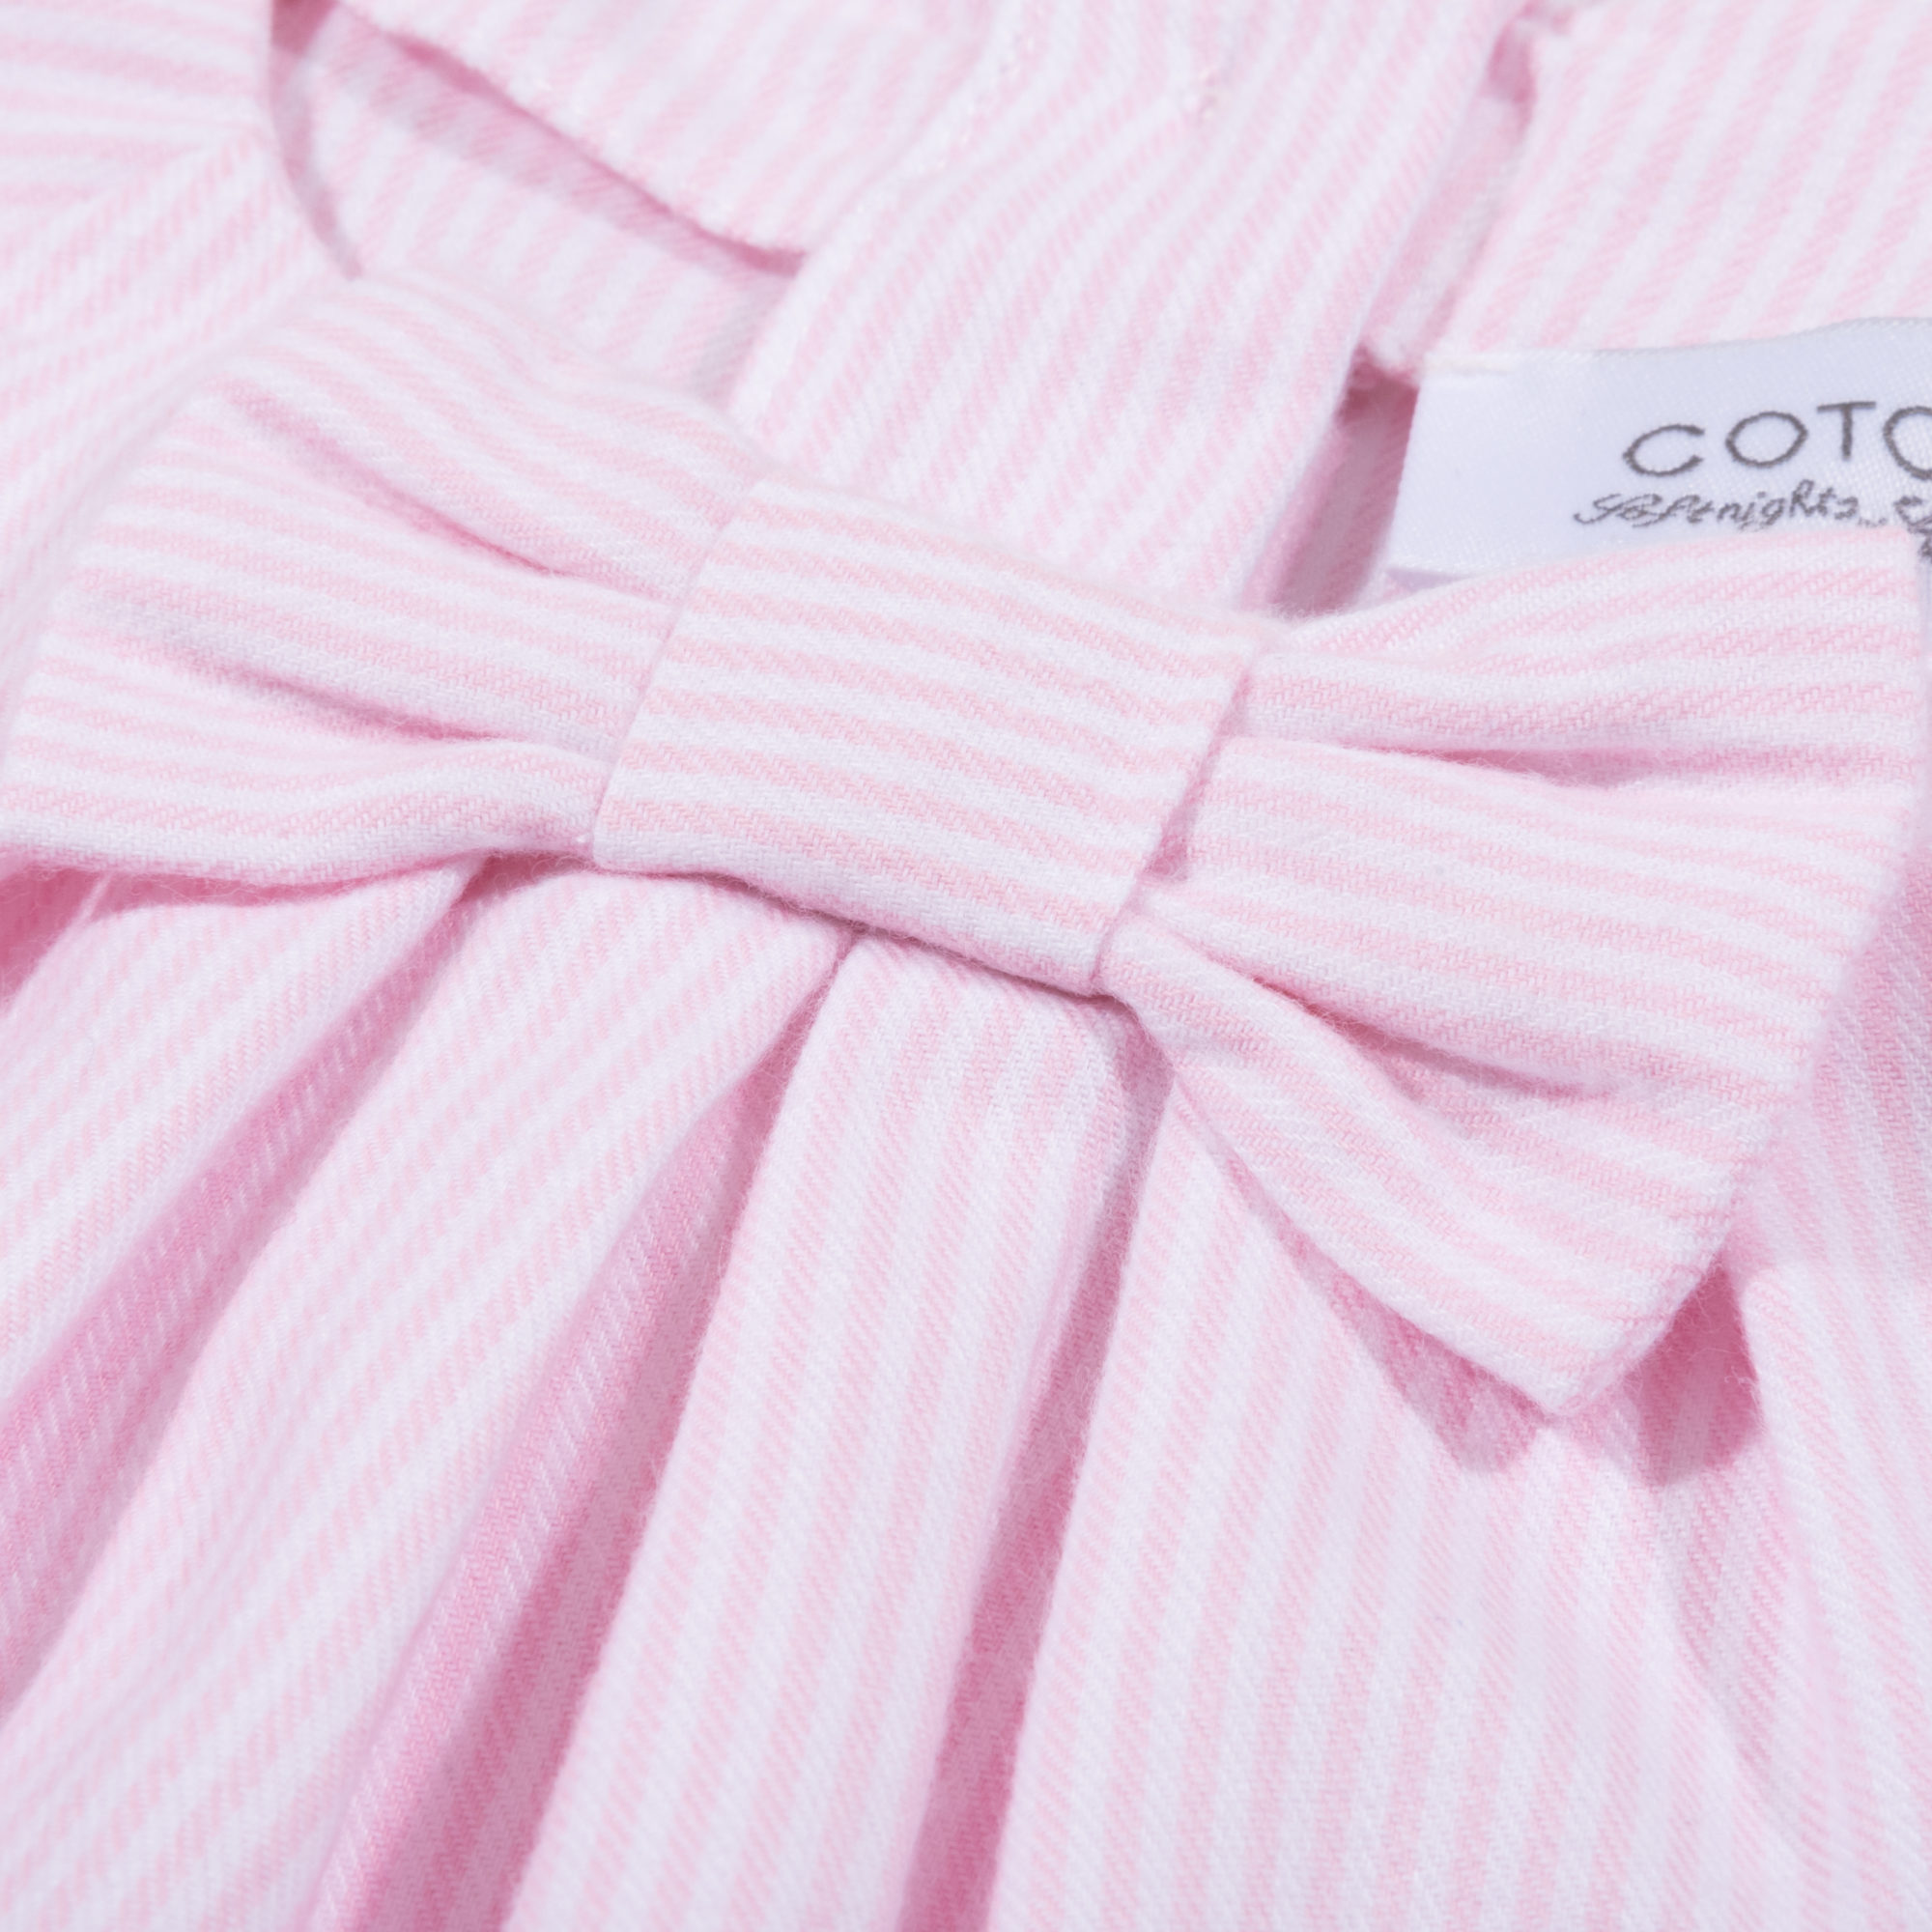 Cotolini Pyjama LM, Gestreept, Flanel, Strik